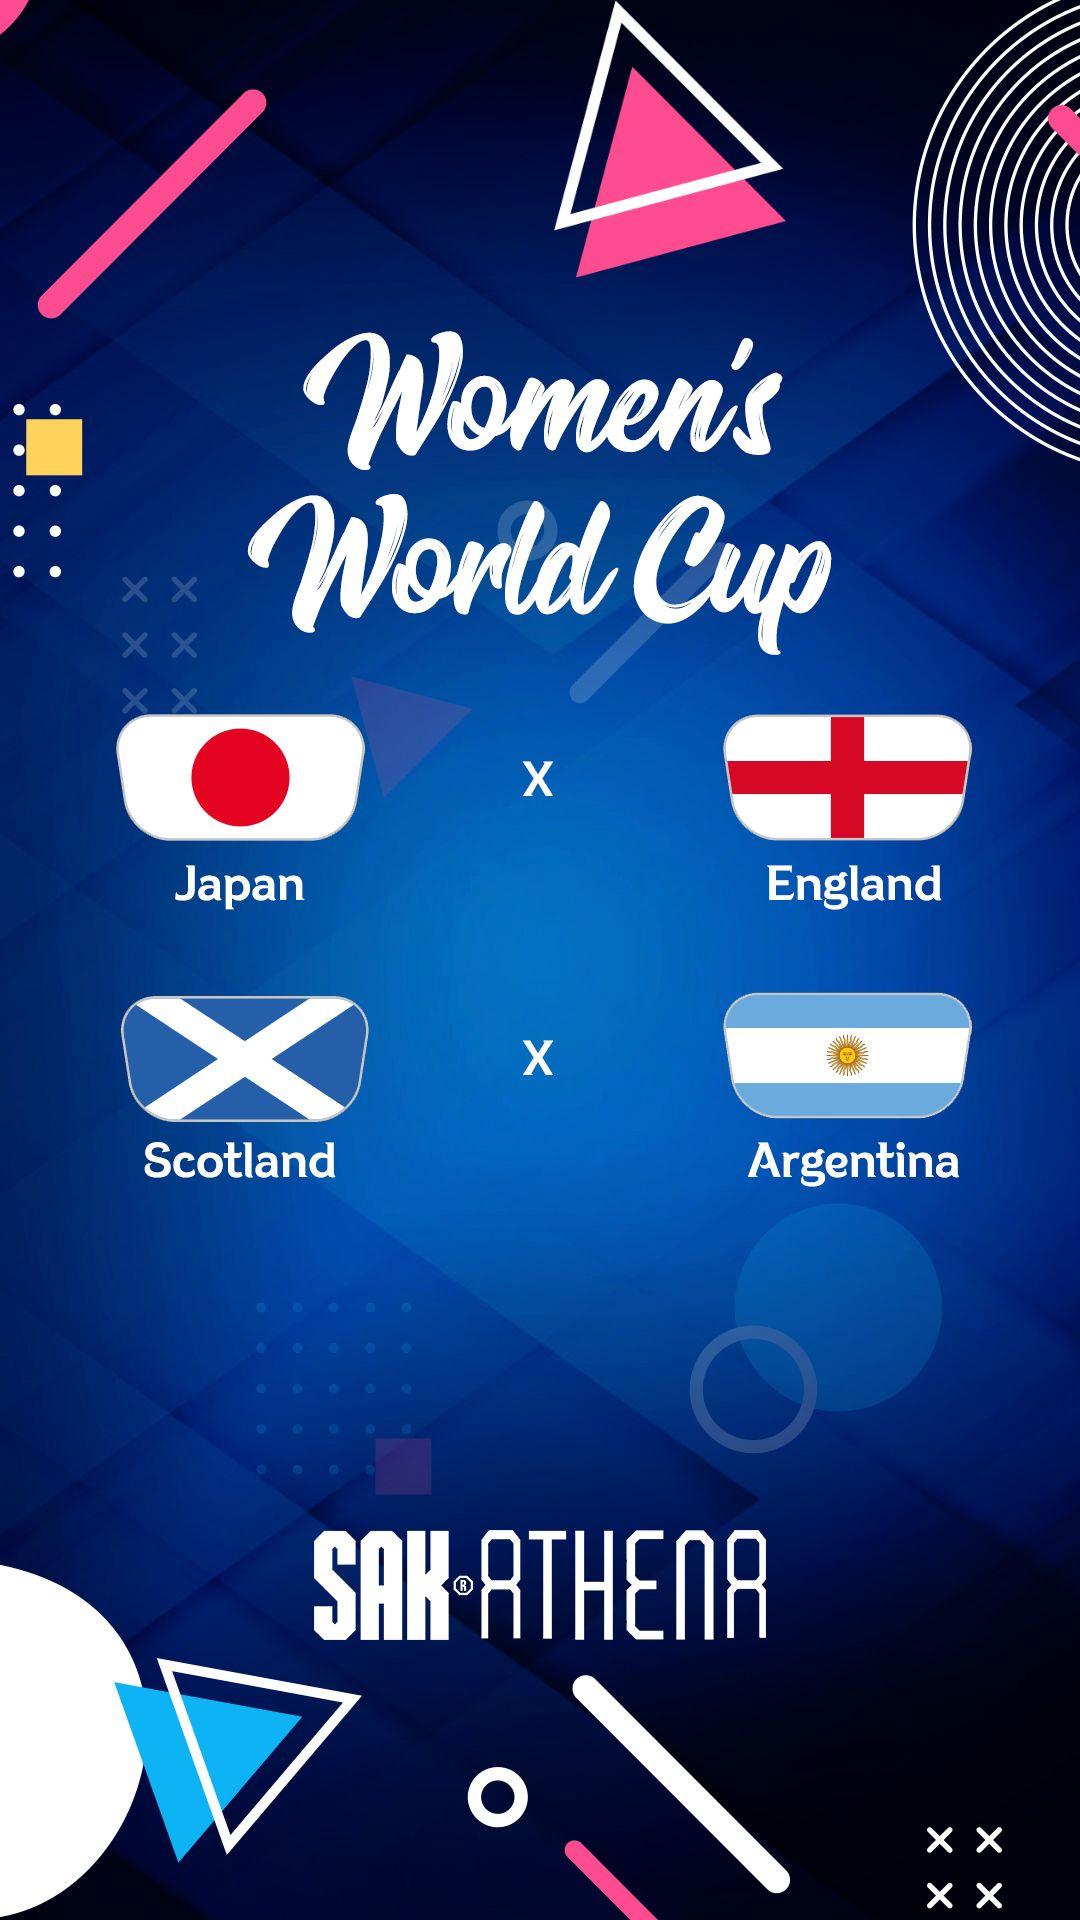 Women Soccer World Cup 2019 | Soccer world, Fifa women's world cup,  Motivational soccer quotes